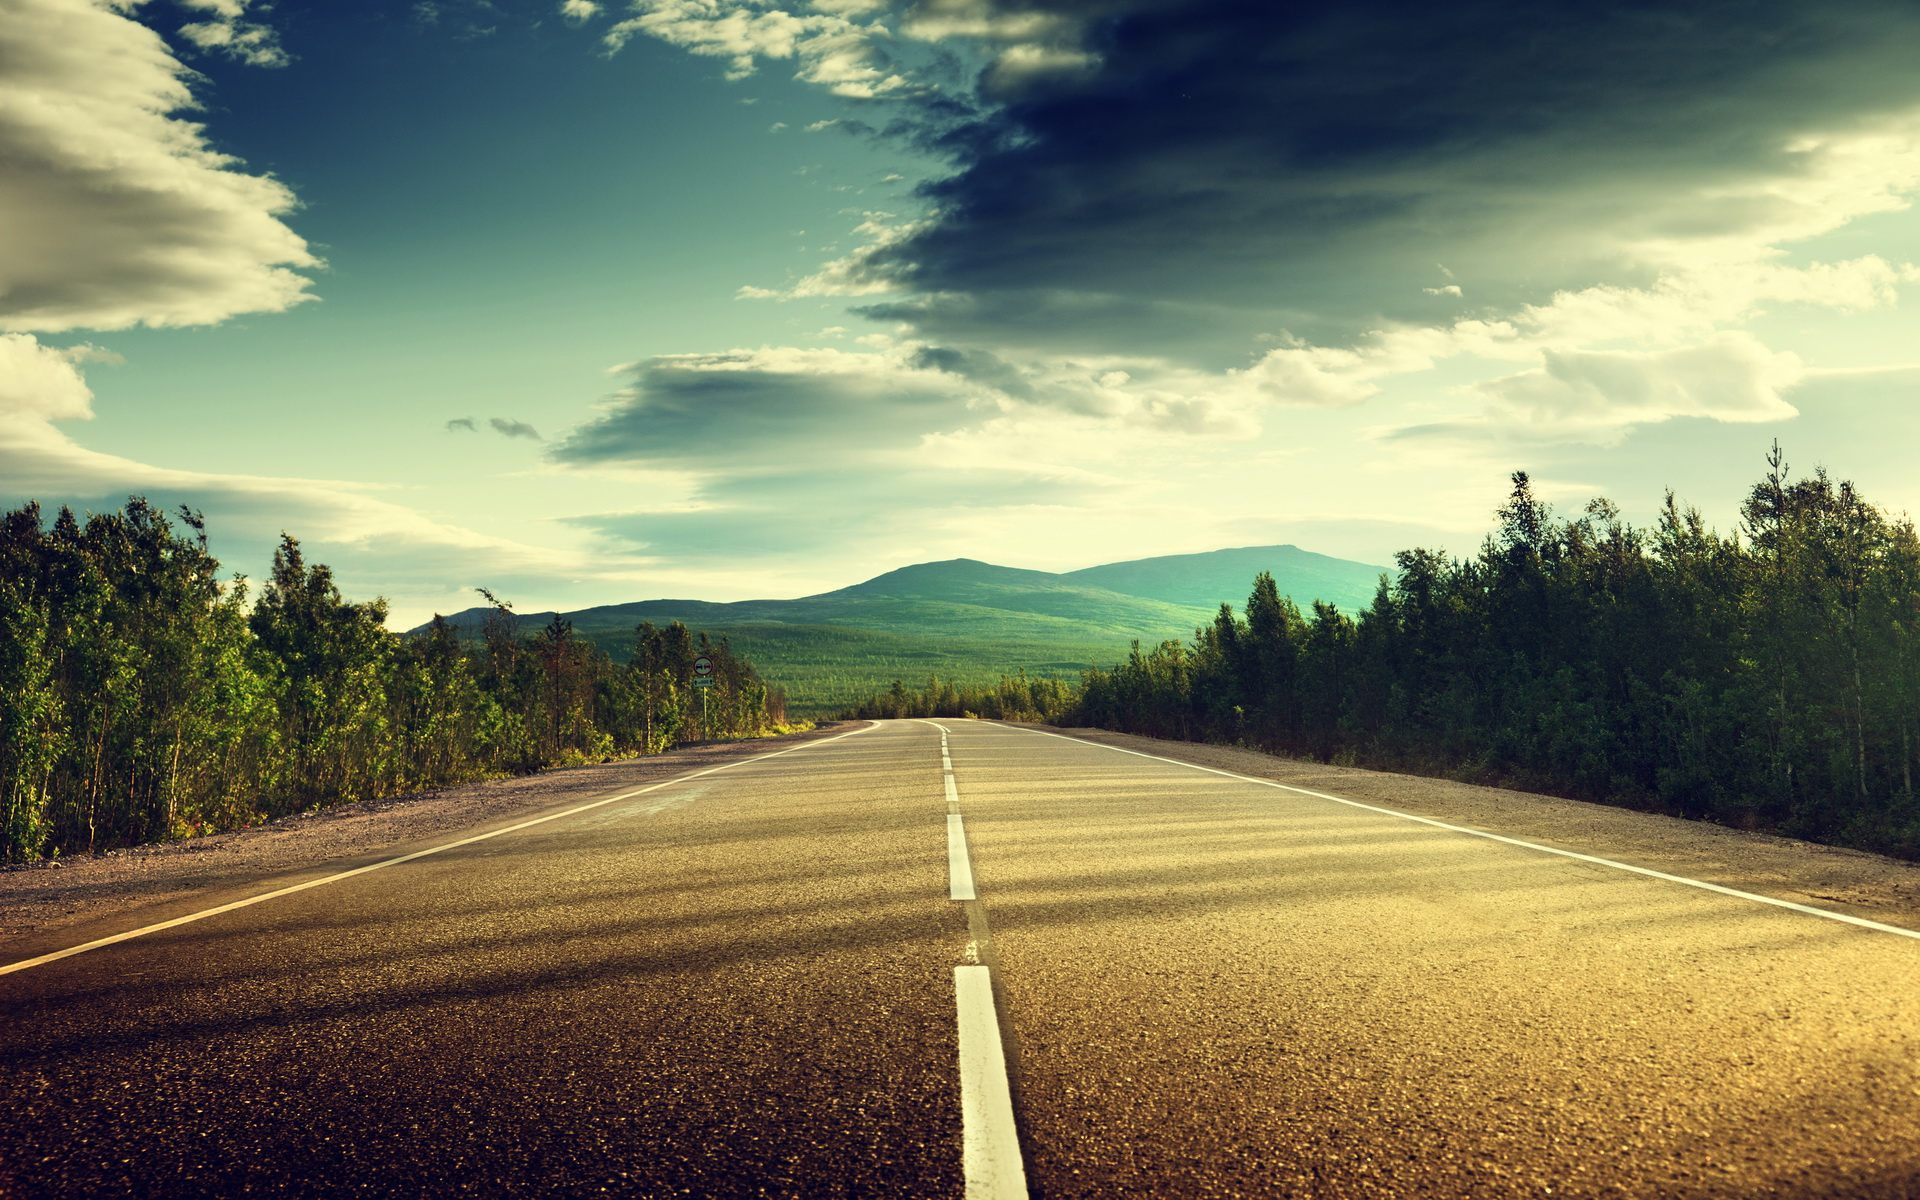 Free stock photos of open road ·